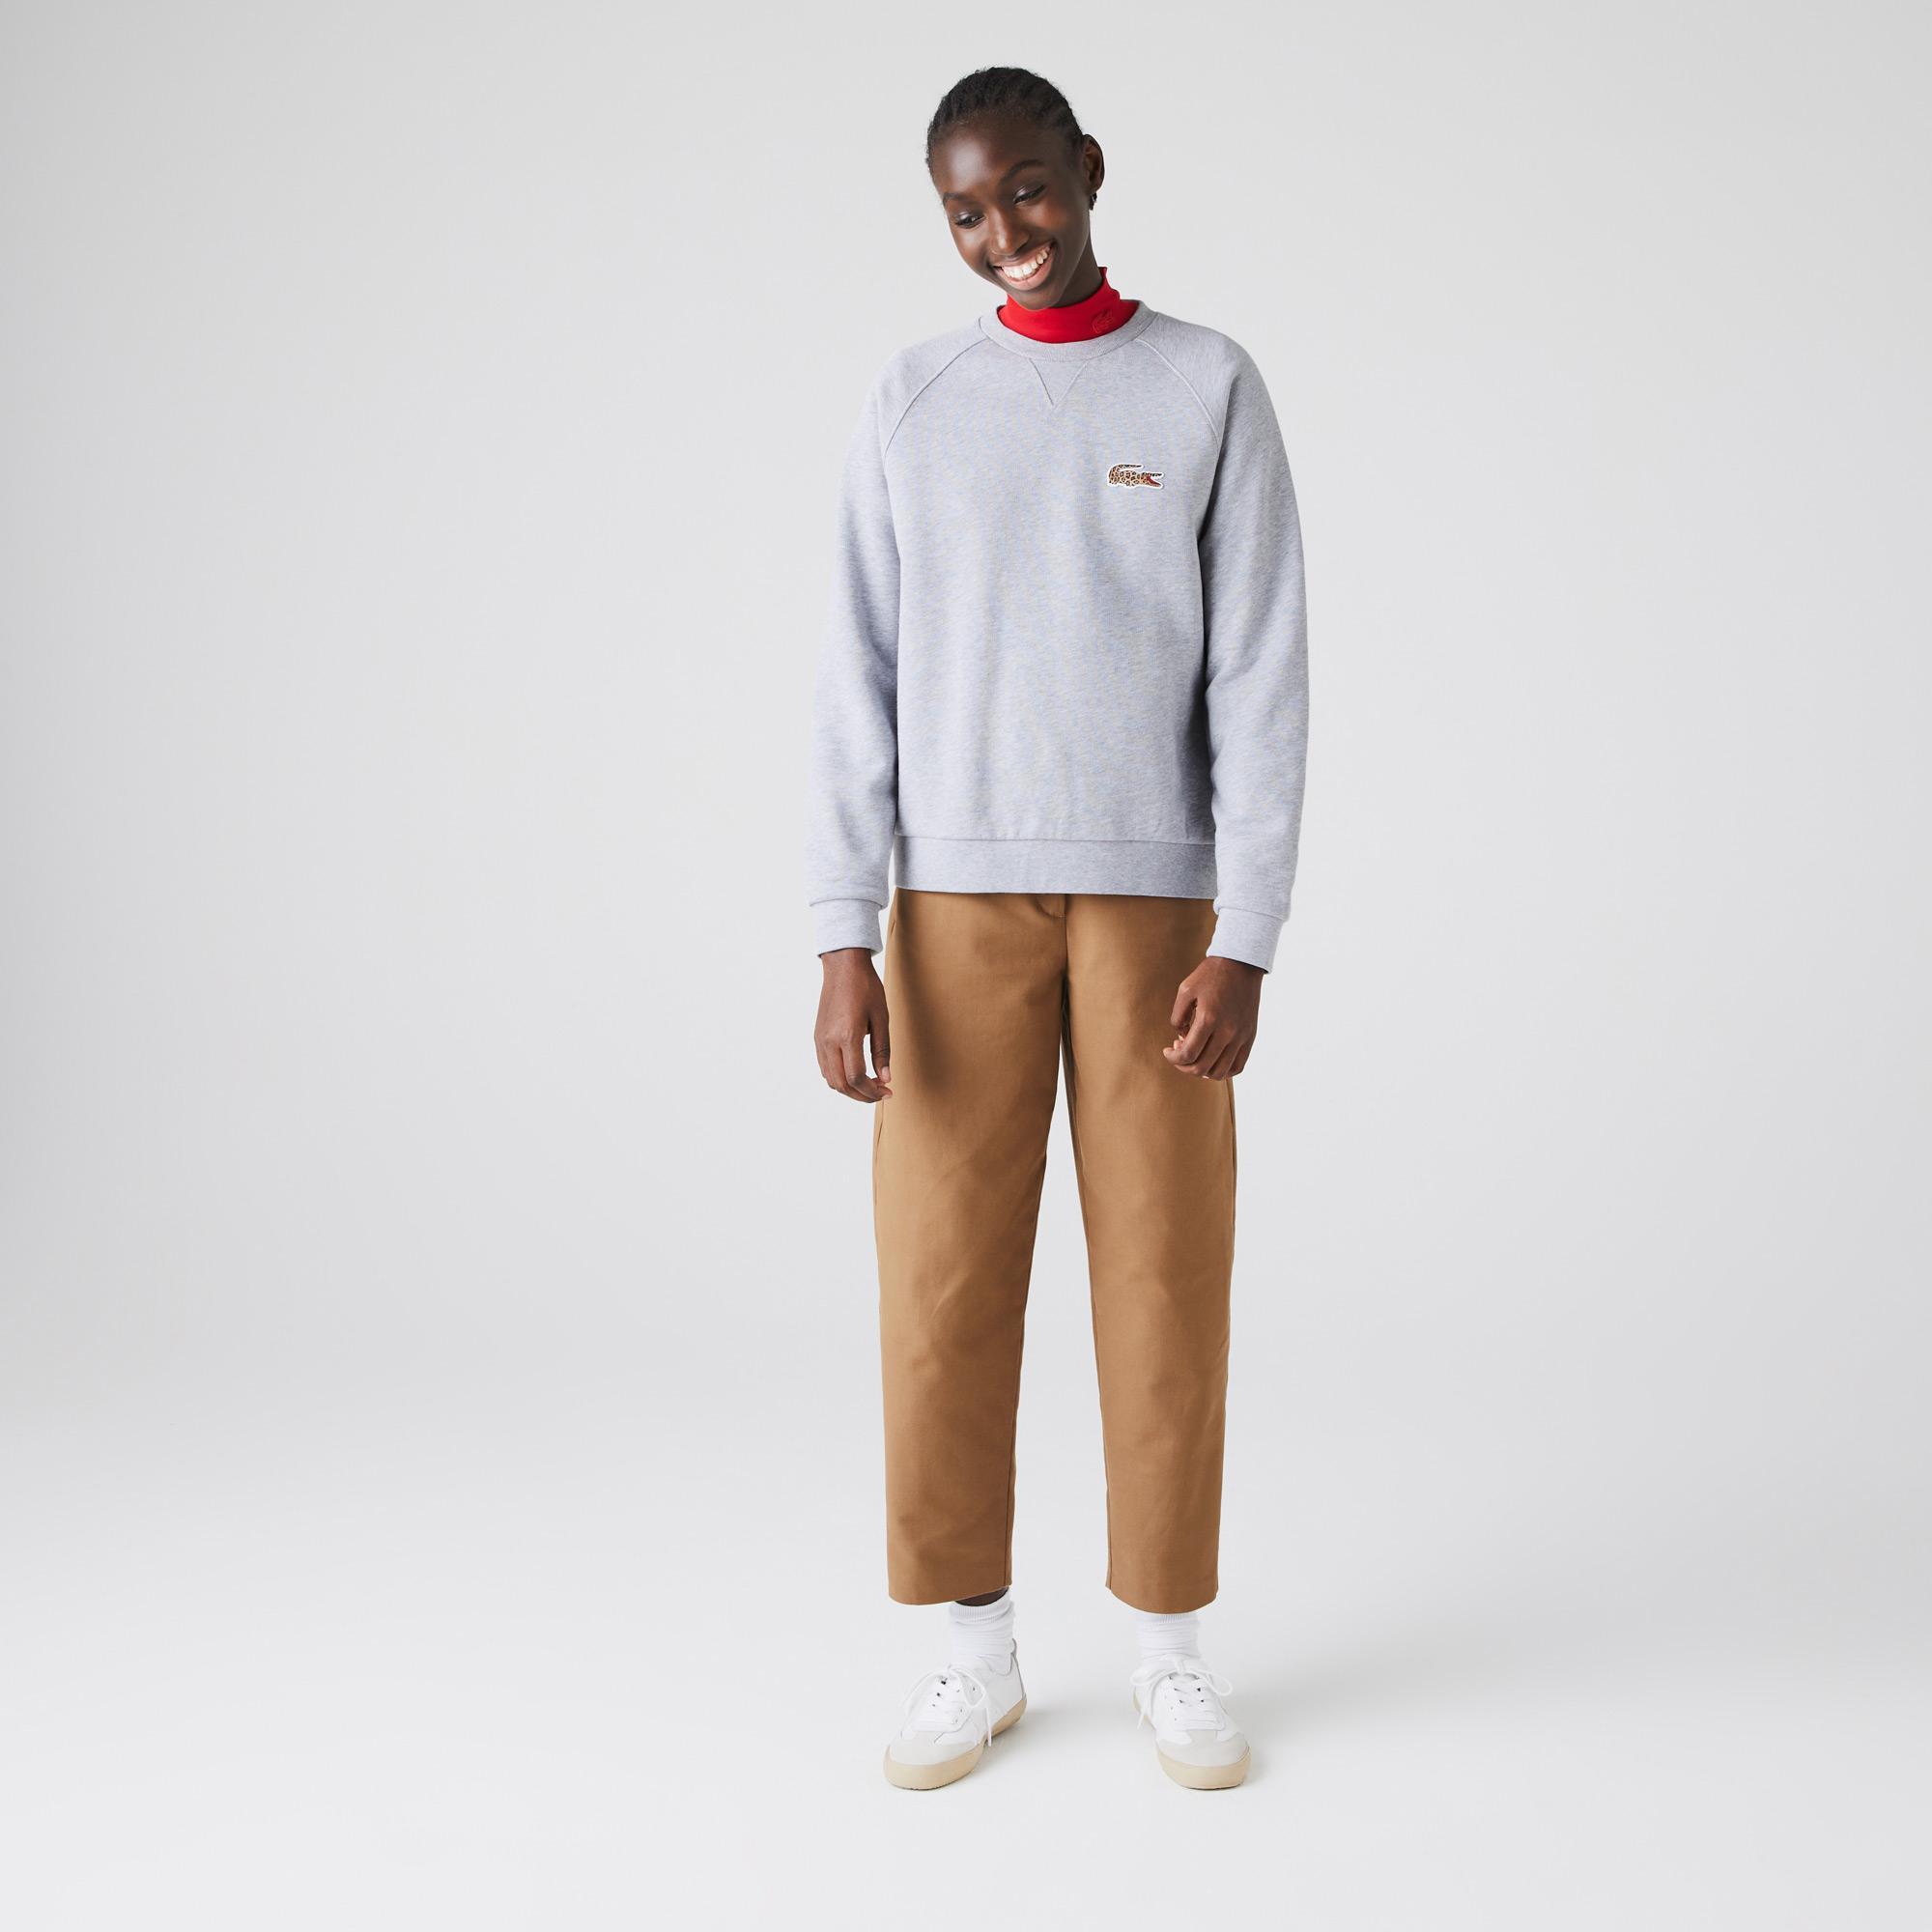 Lacoste Women's x National Geographic Cotton Fleece Sweatshirt